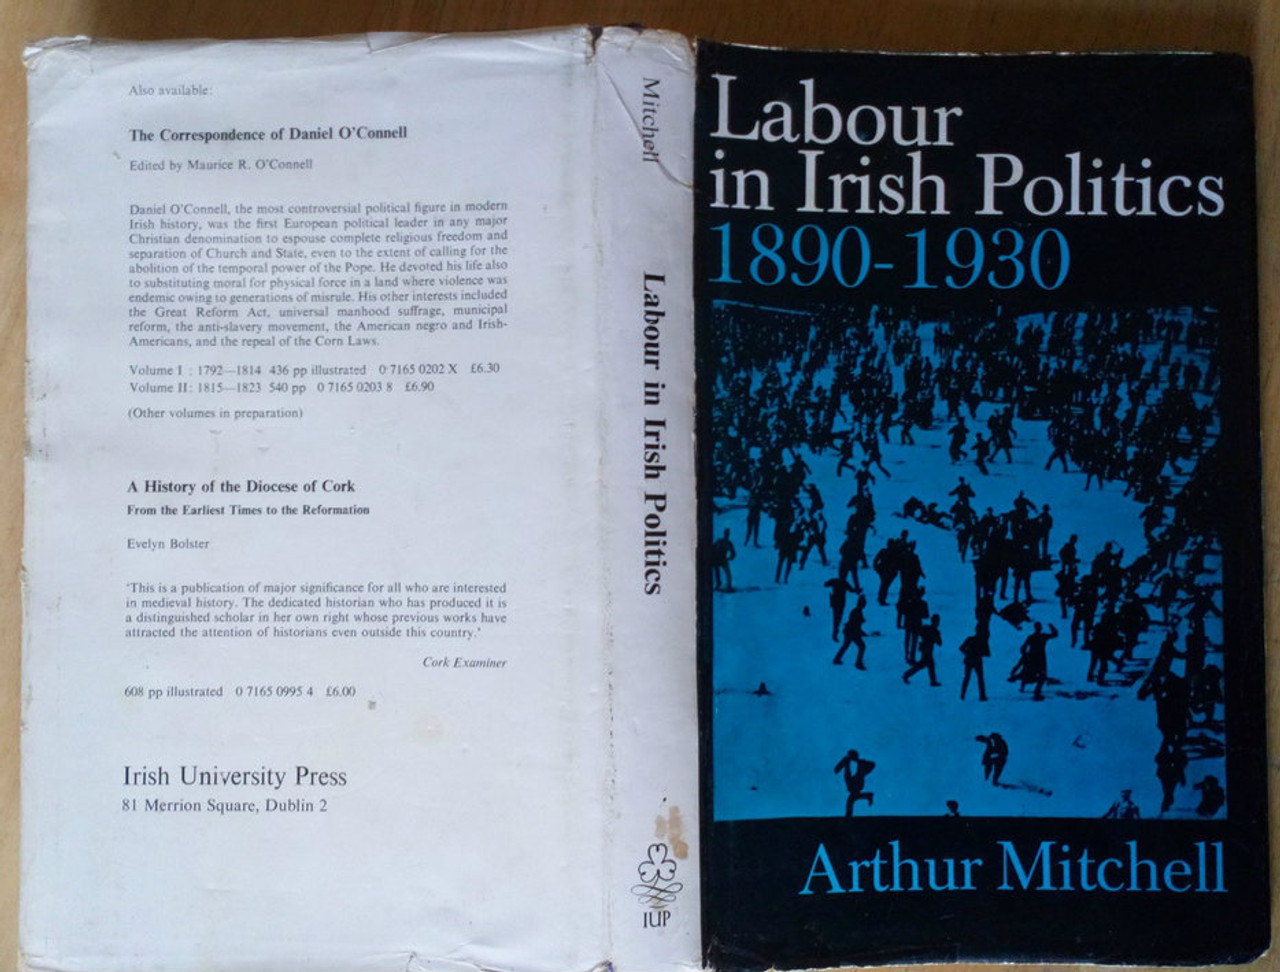 Mitchell, Arthur - Labour in Irish Politics 1890-1930 HB - 1974 IUP